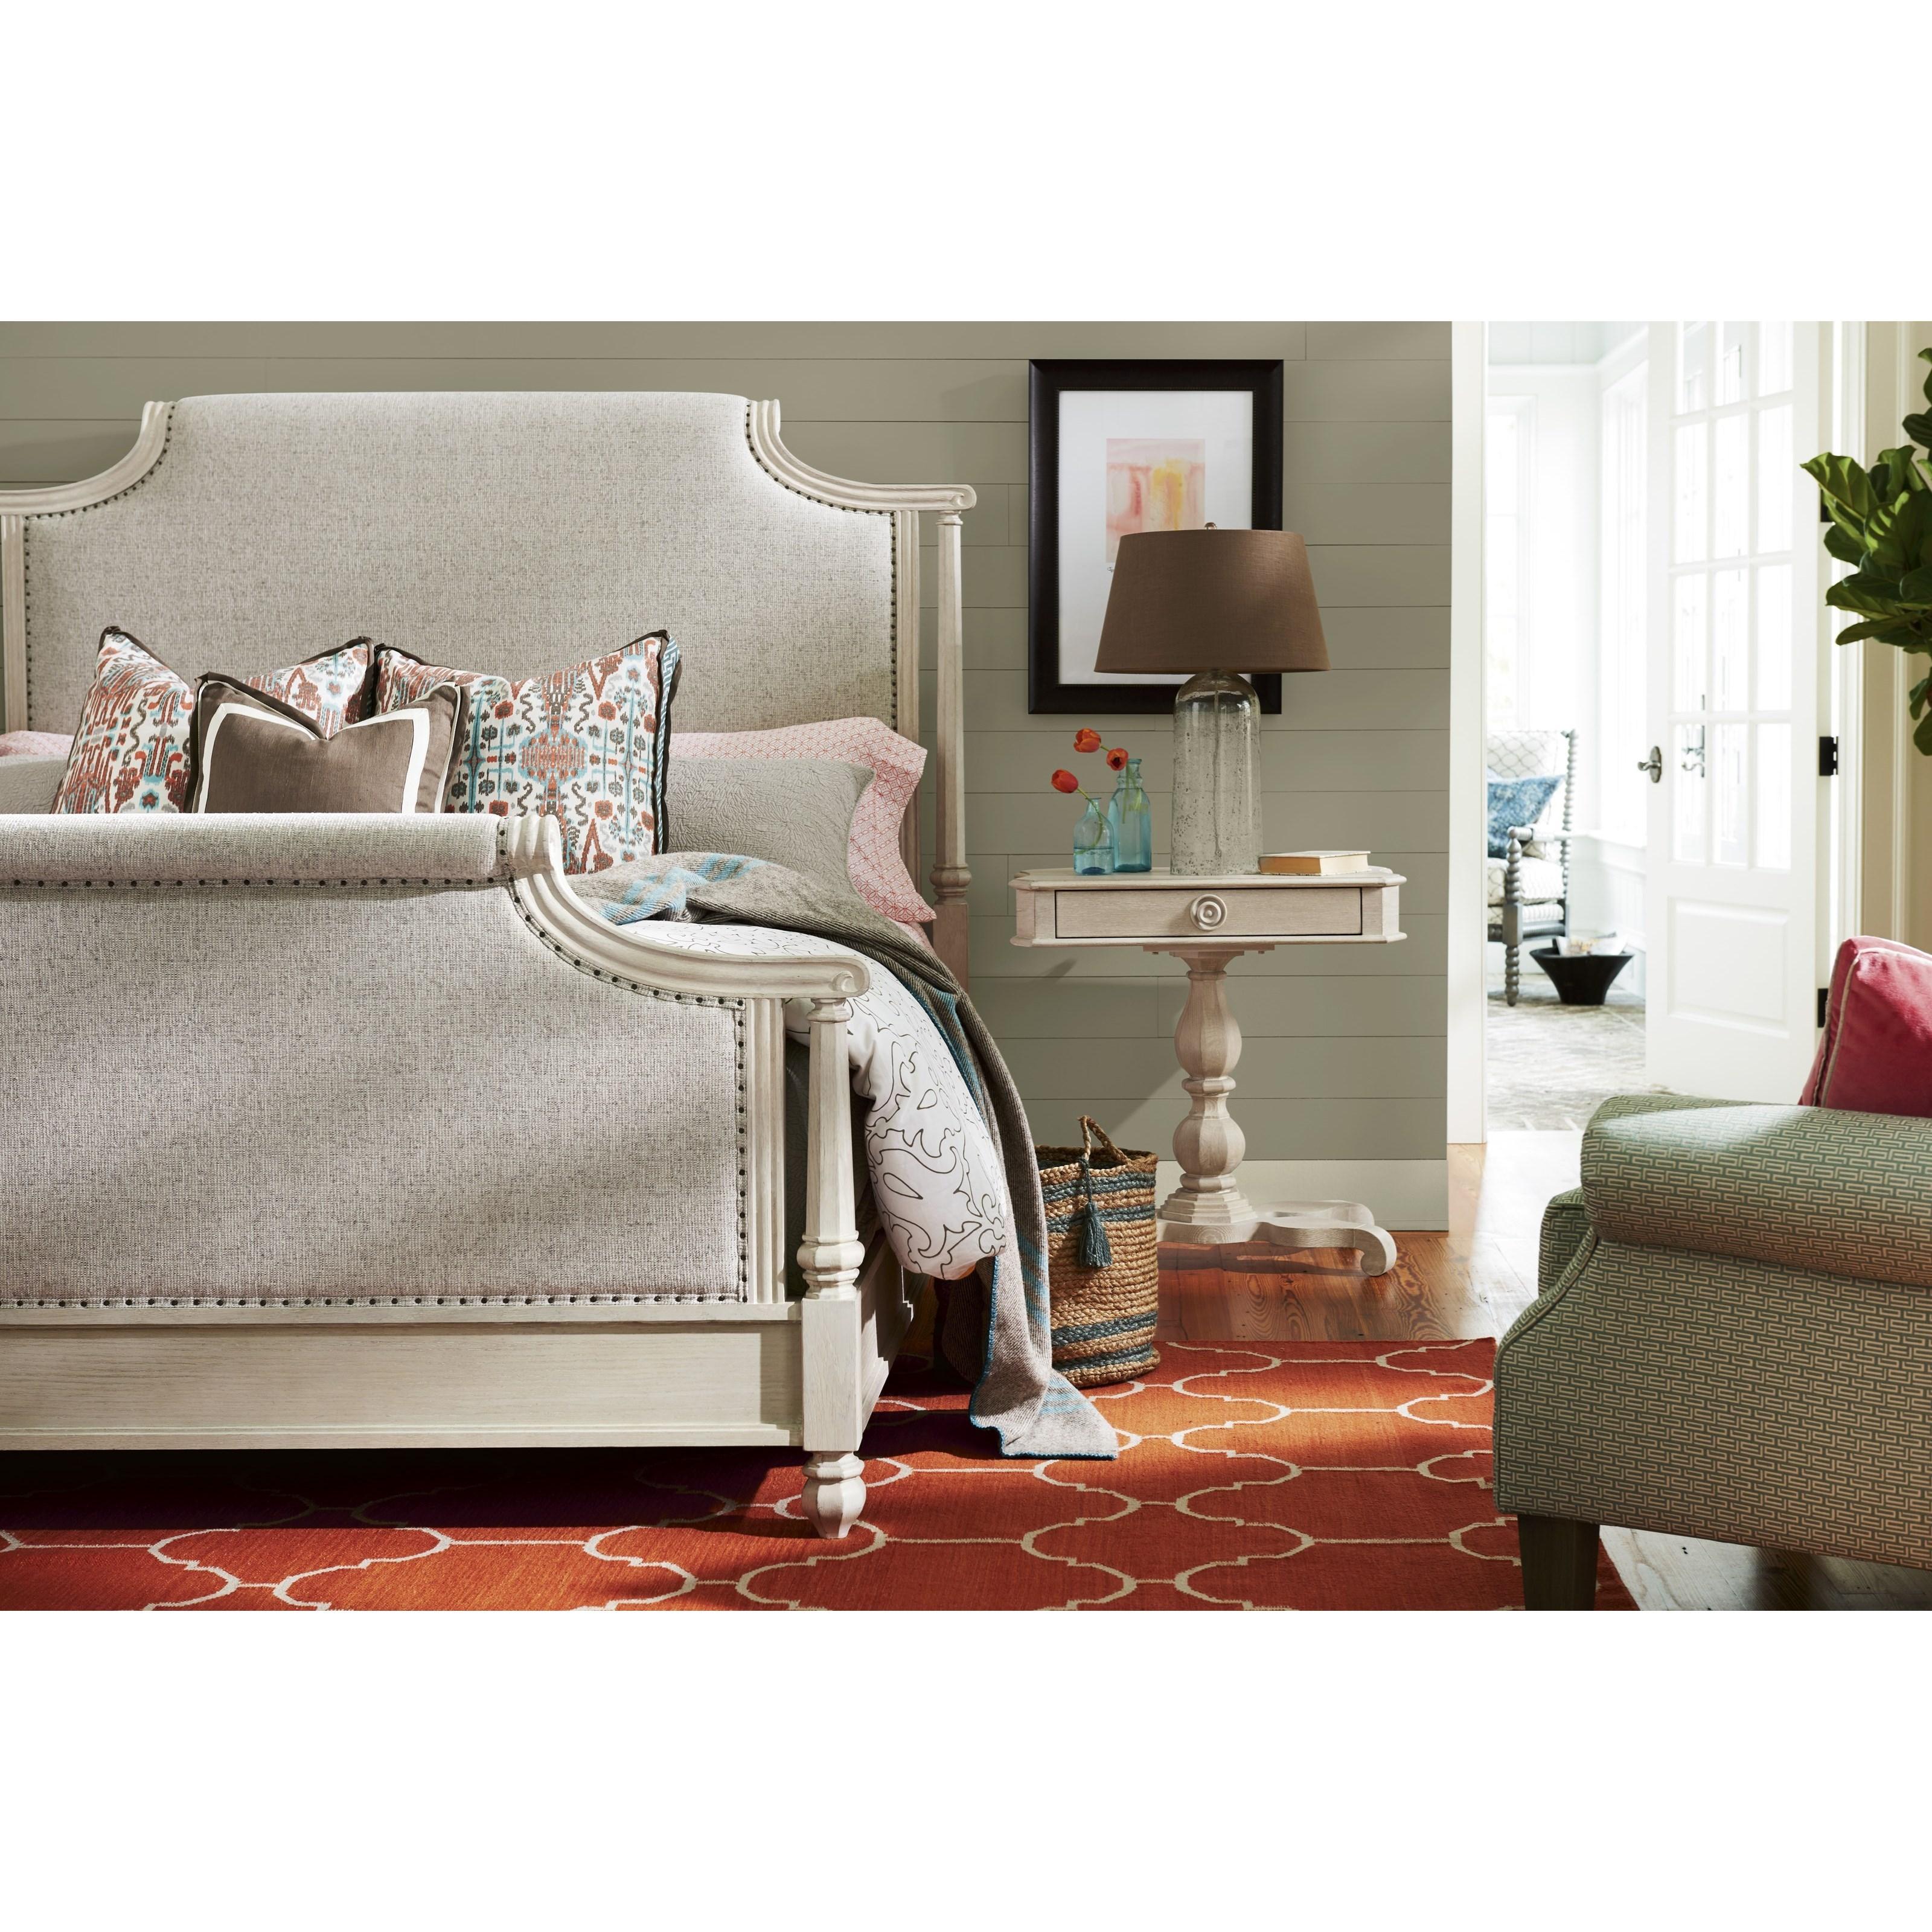 Paula Deen By Universal Bungalow 795365 Cottage Bedside